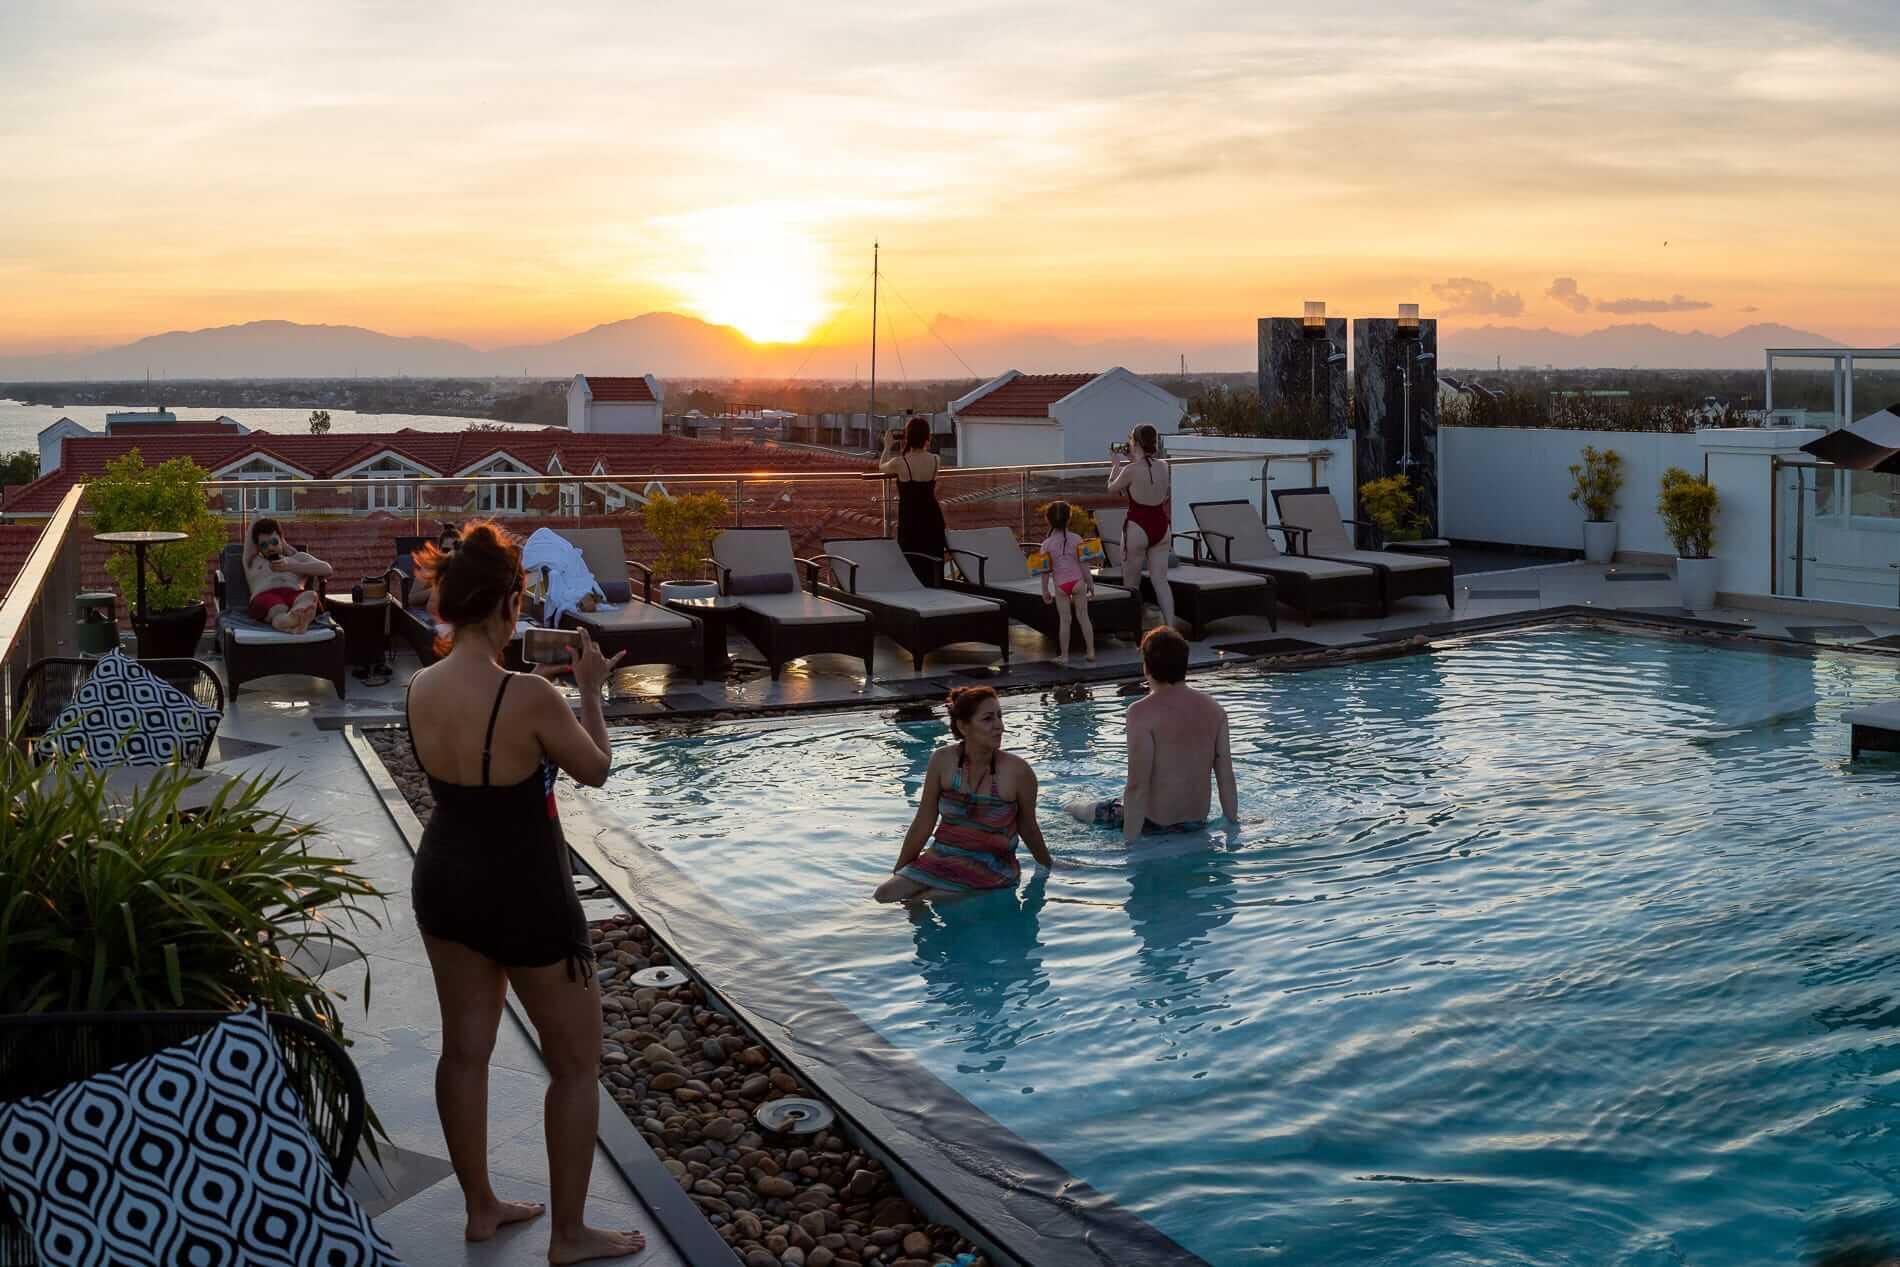 Hoi An Rooftop bar at Sunset